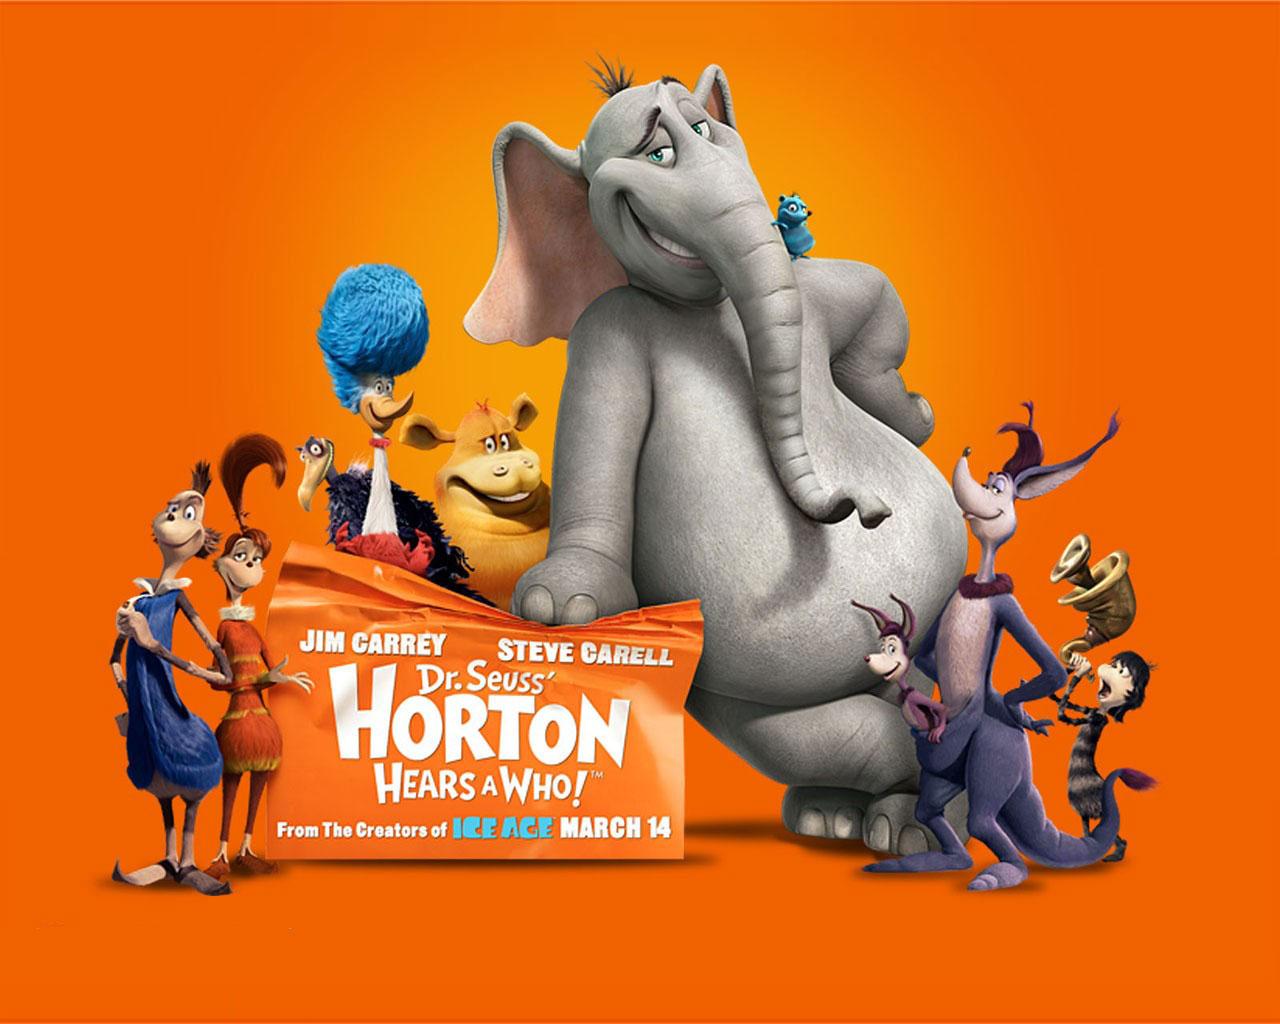 horton-hears-a-who.jpg